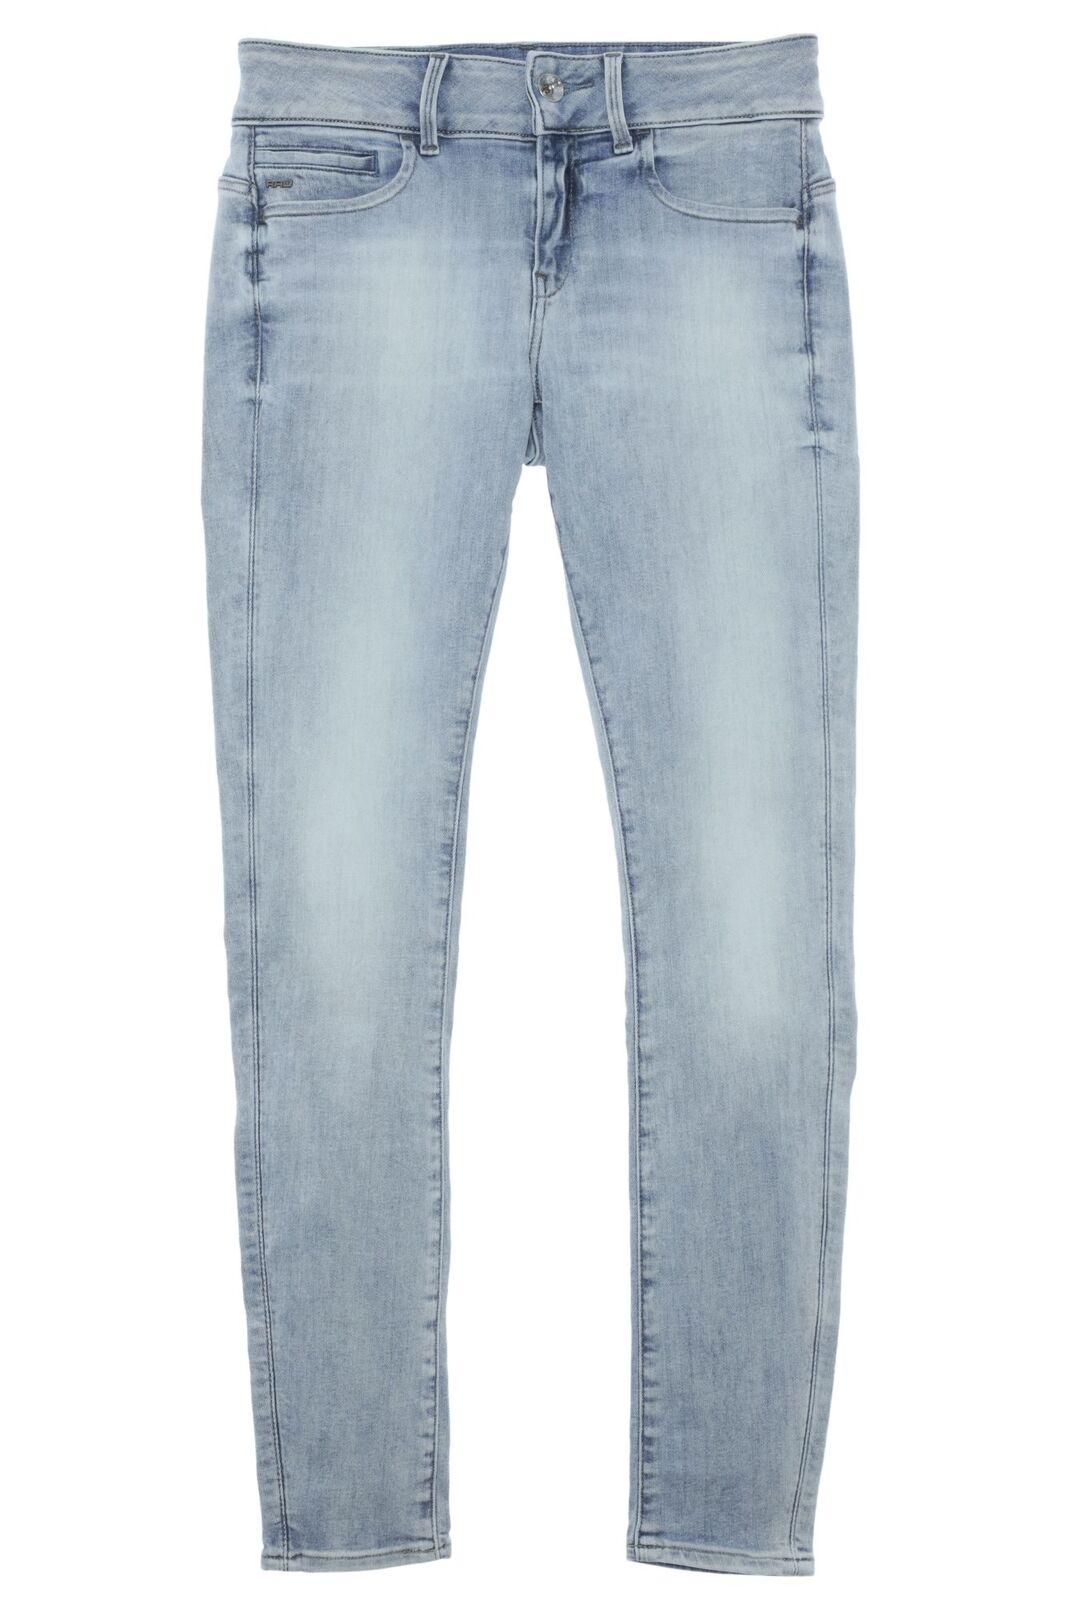 G Star Midge Cody MID Skinny Jeans Hose Pants Damen Super Stretch Used LT Aged